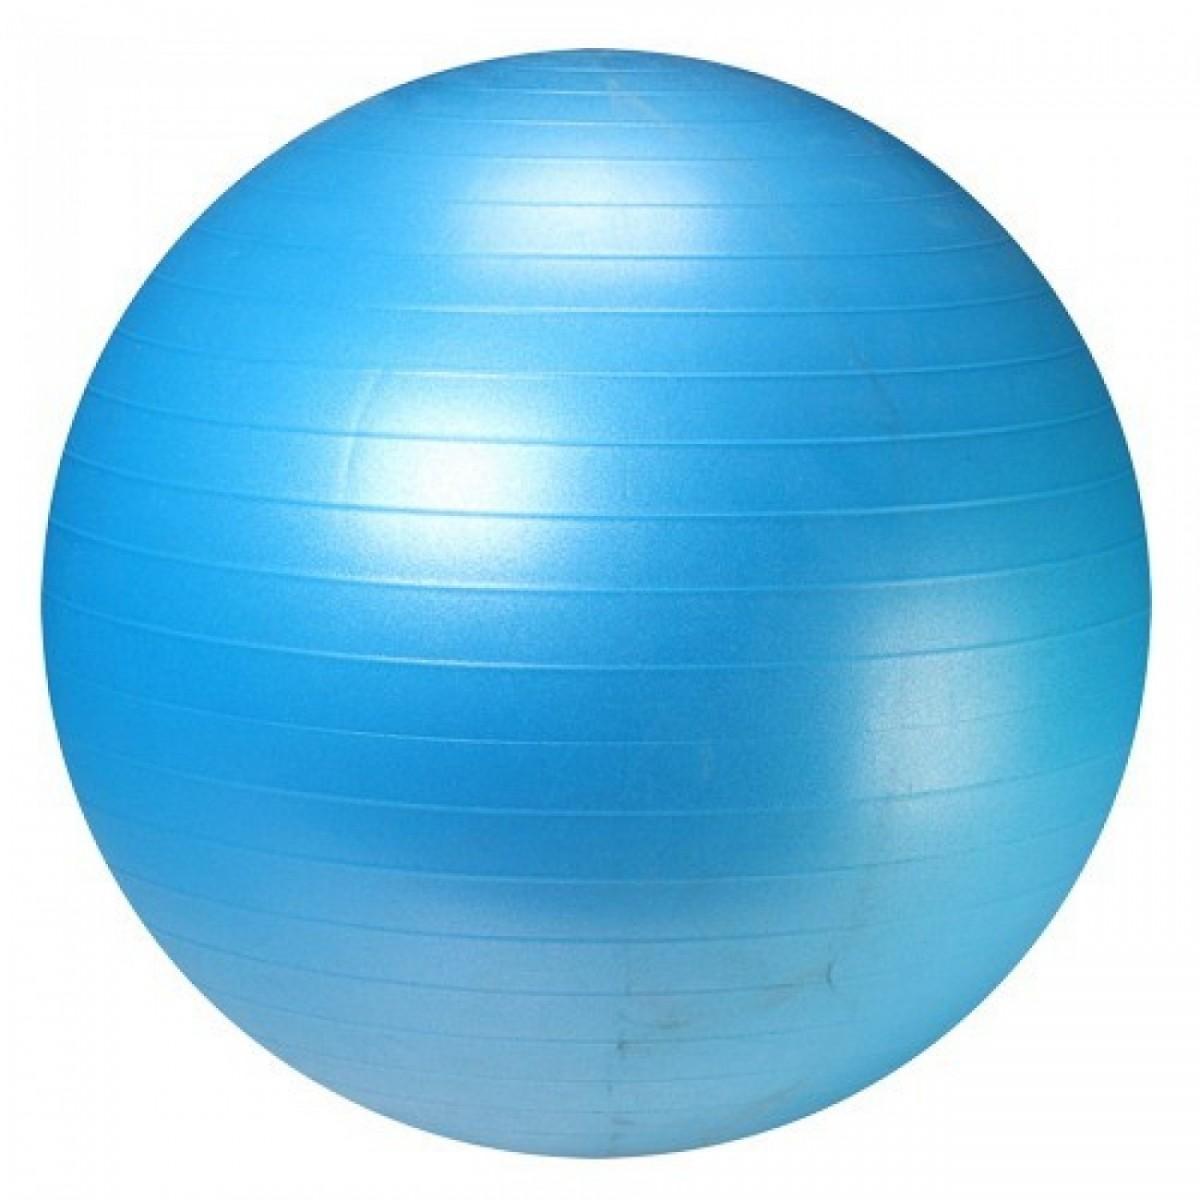 Bola Suíça Para Pilates PREMIUM 75Cm Live Up + Grátis Bomba Inflar - Loja Portal